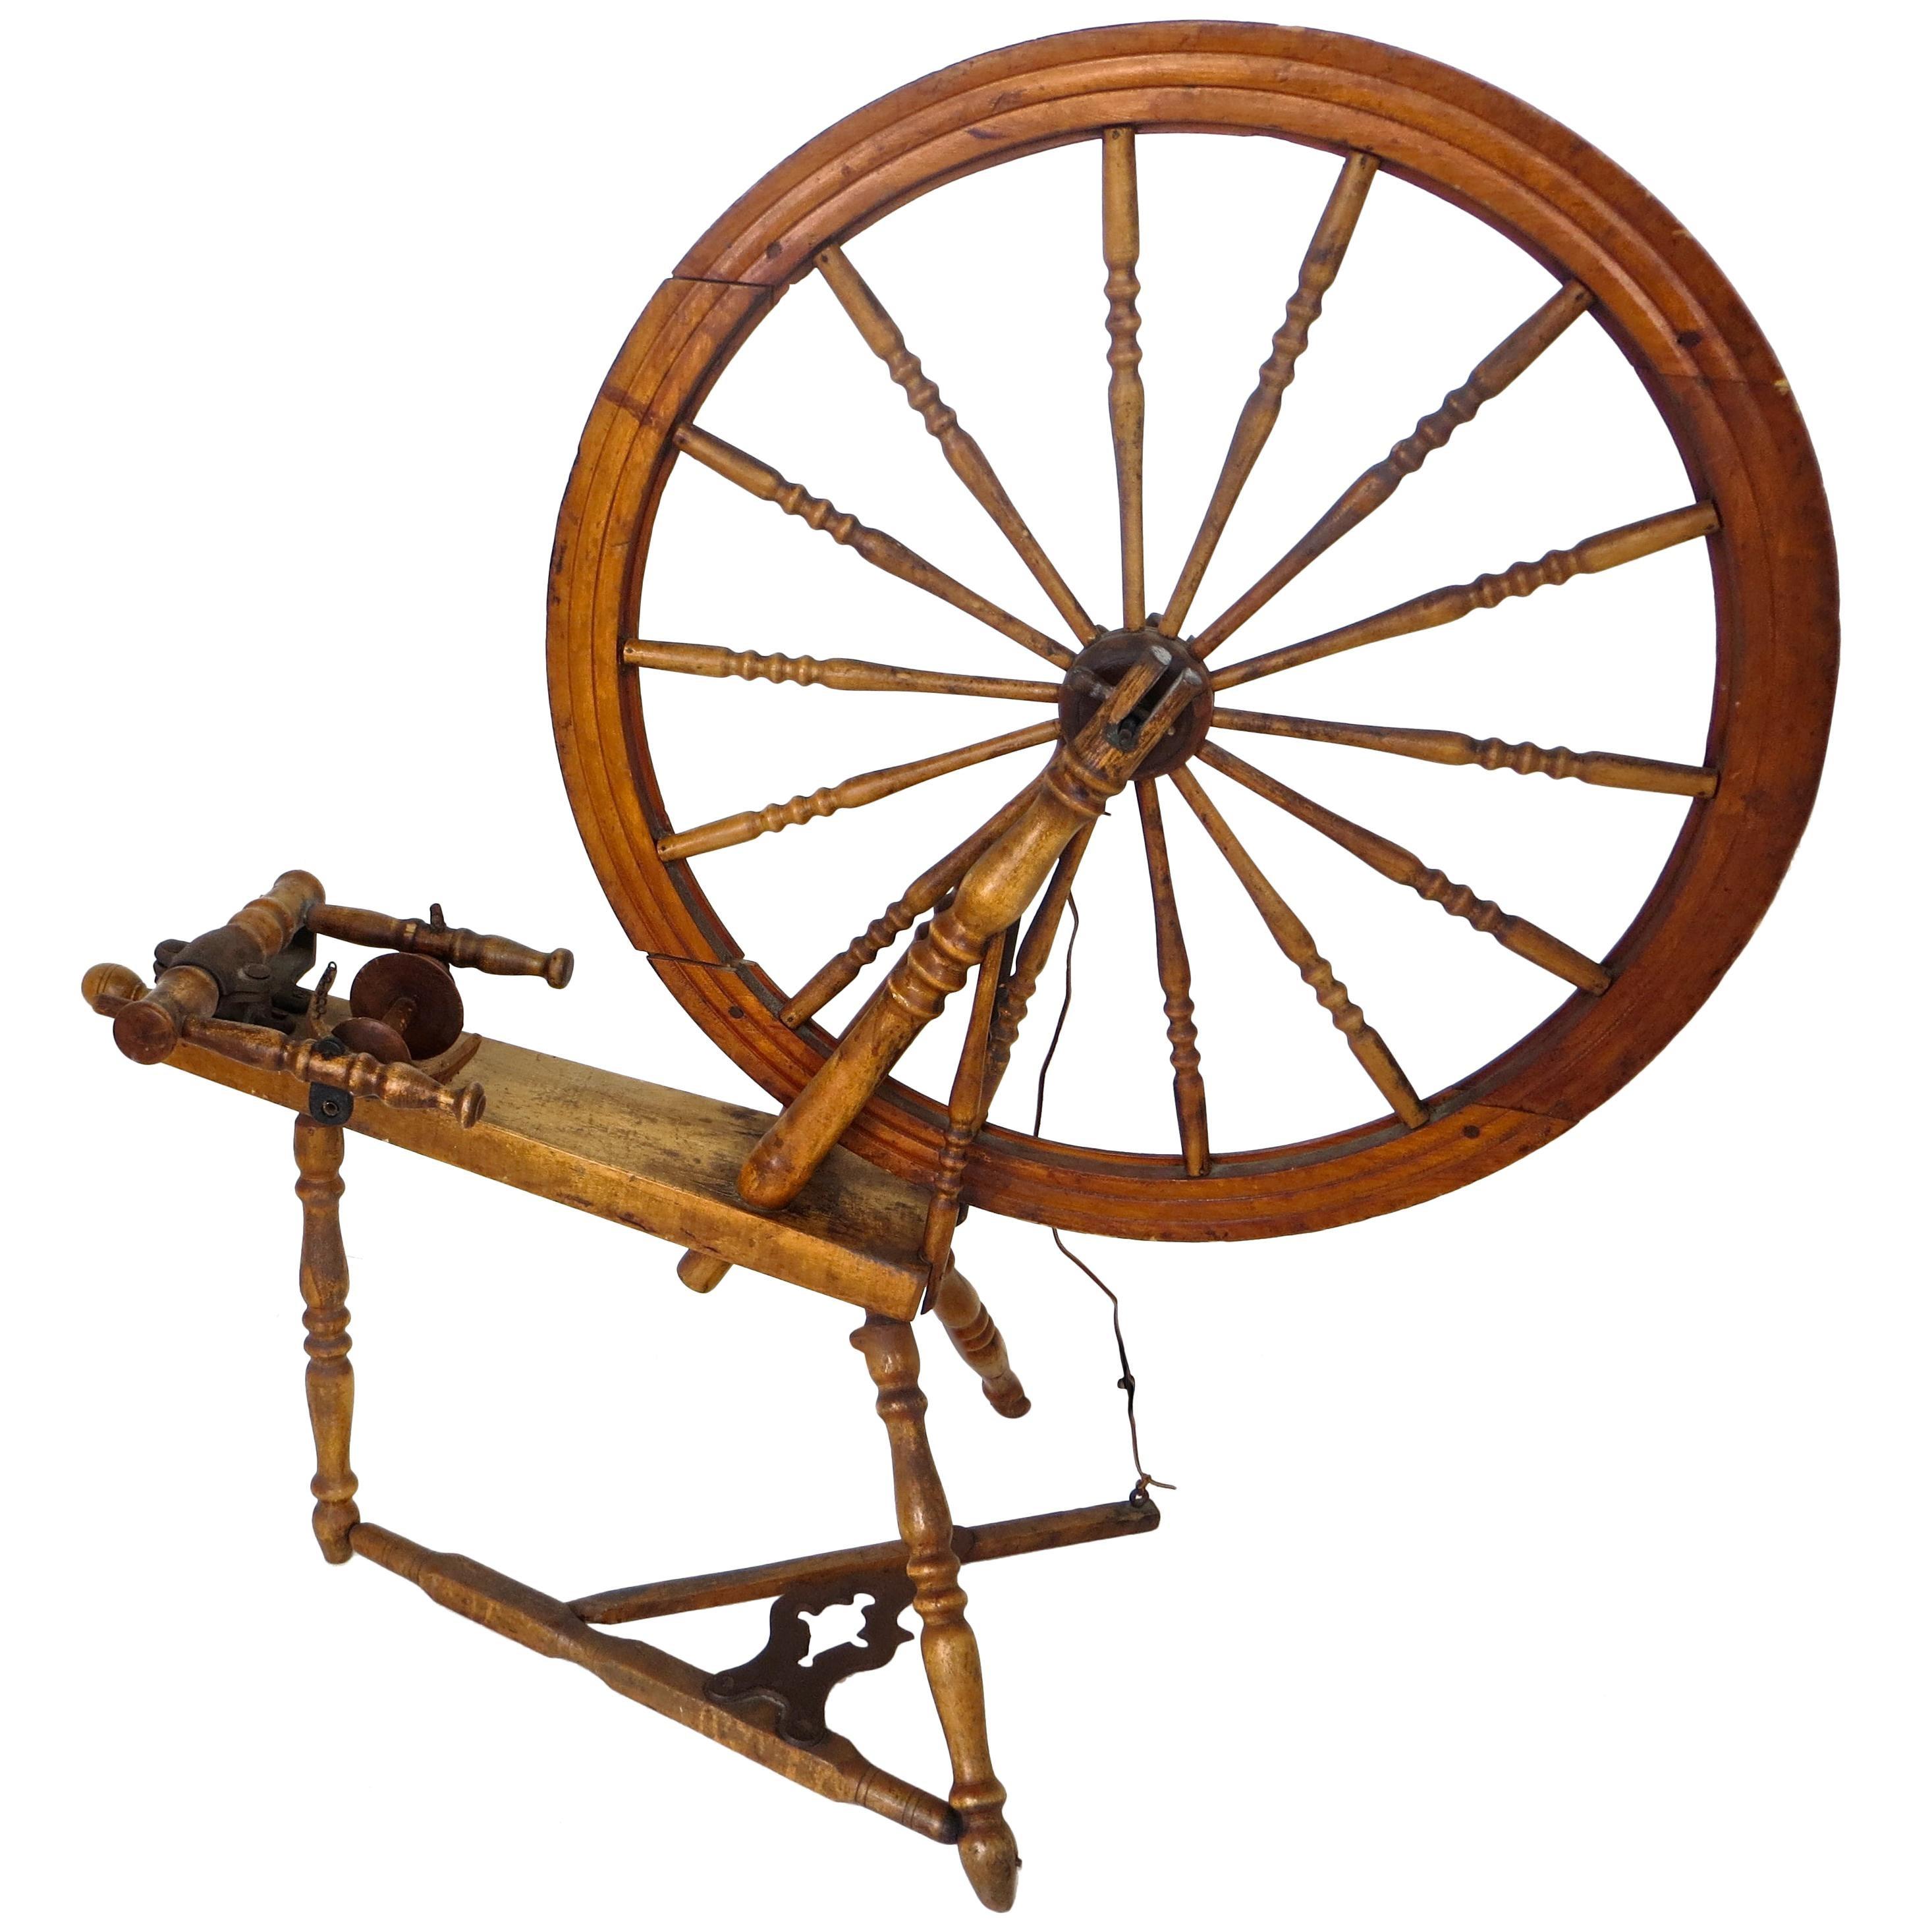 Mid-19th Century American Spinning Wheel